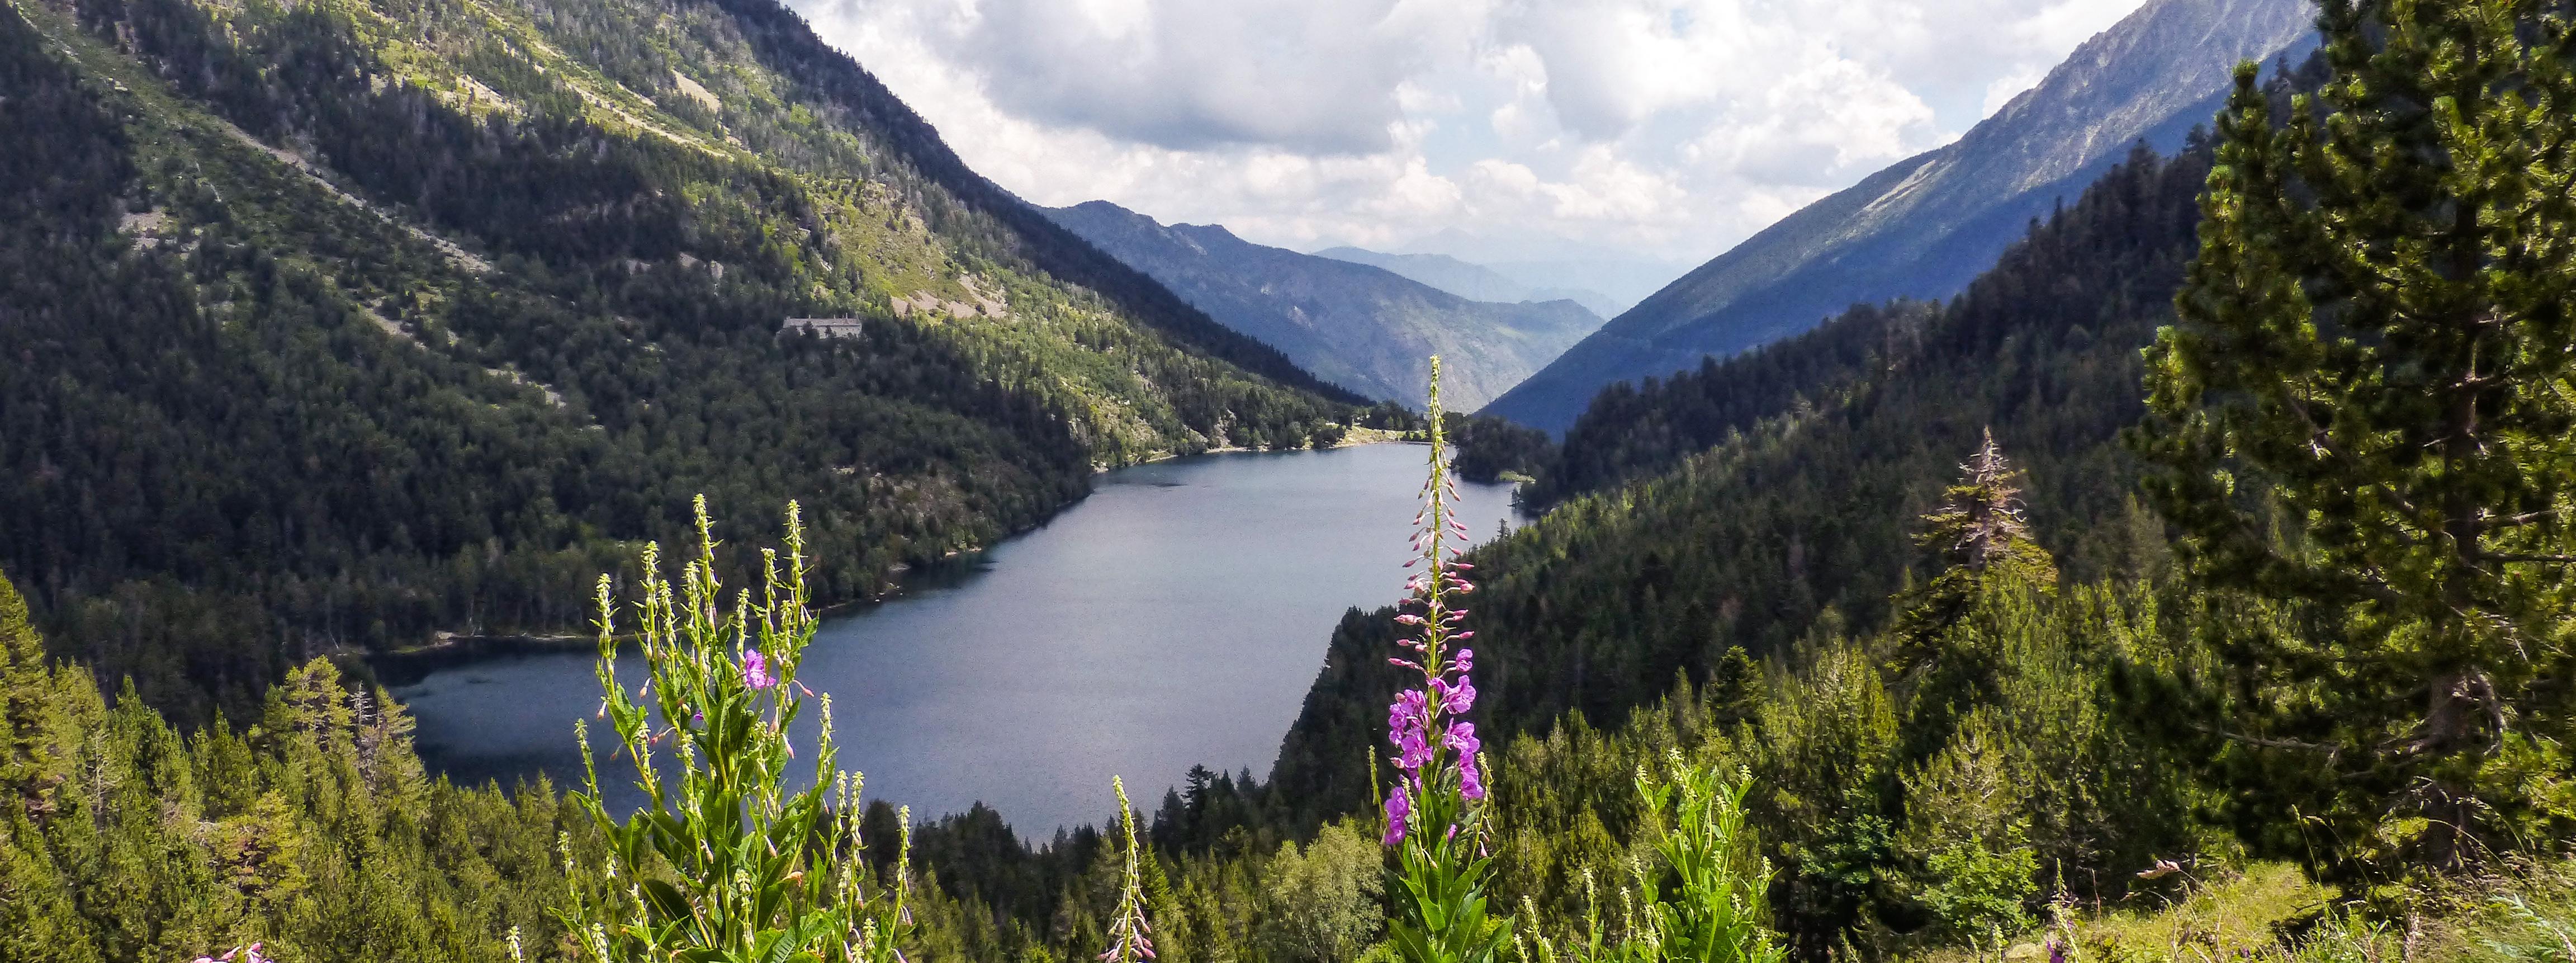 lago-san-mauricio_